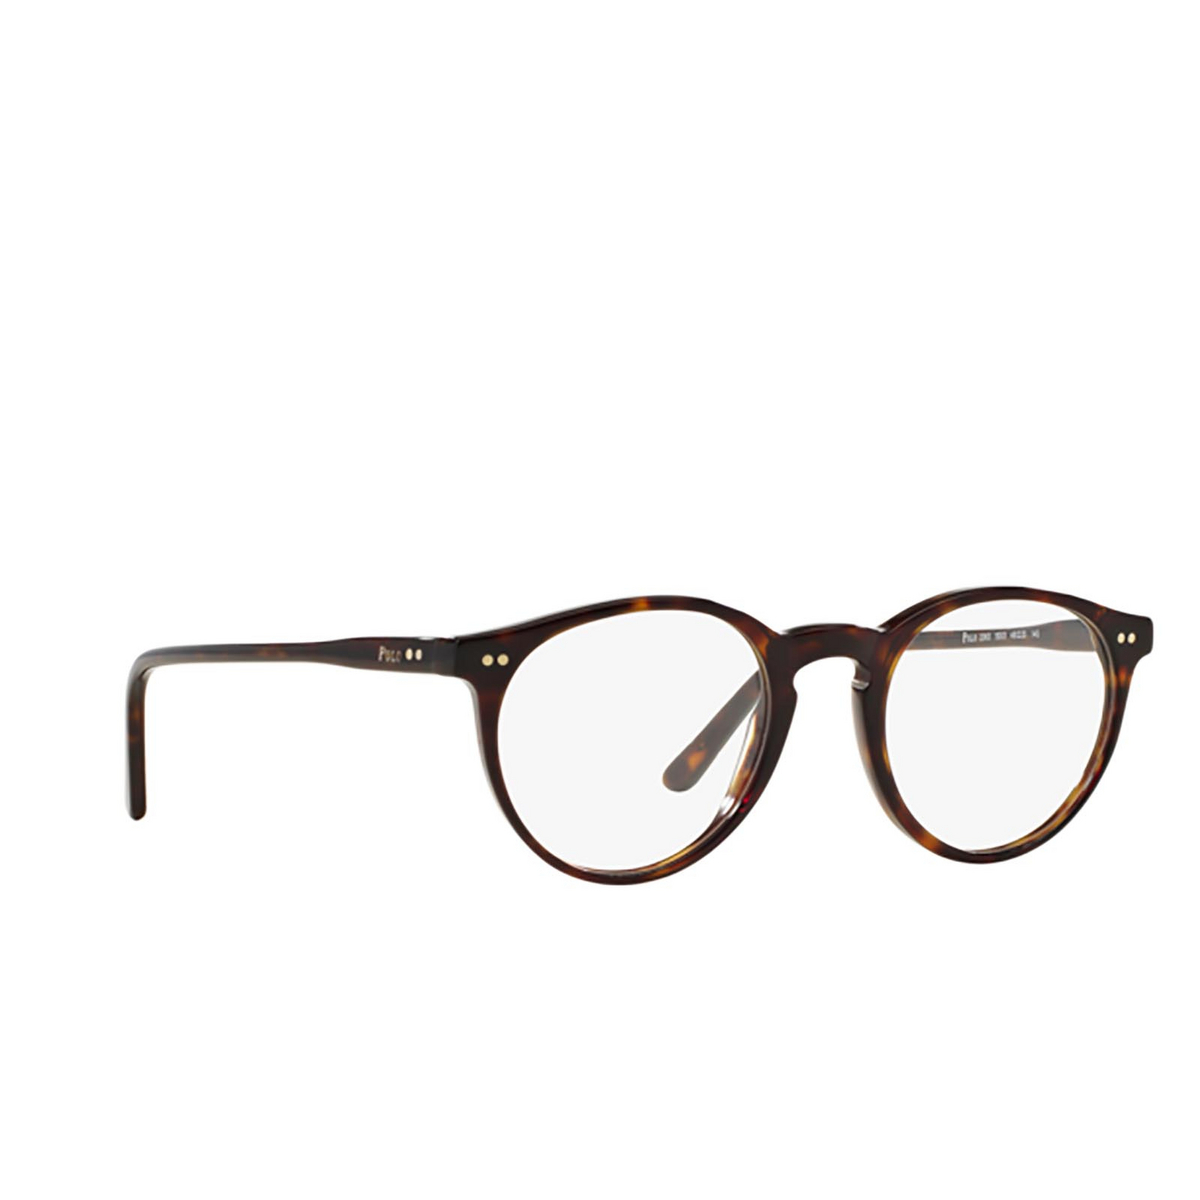 Polo Ralph Lauren® Round Eyeglasses: PH2083 color Shiny Dark Havana 5003.